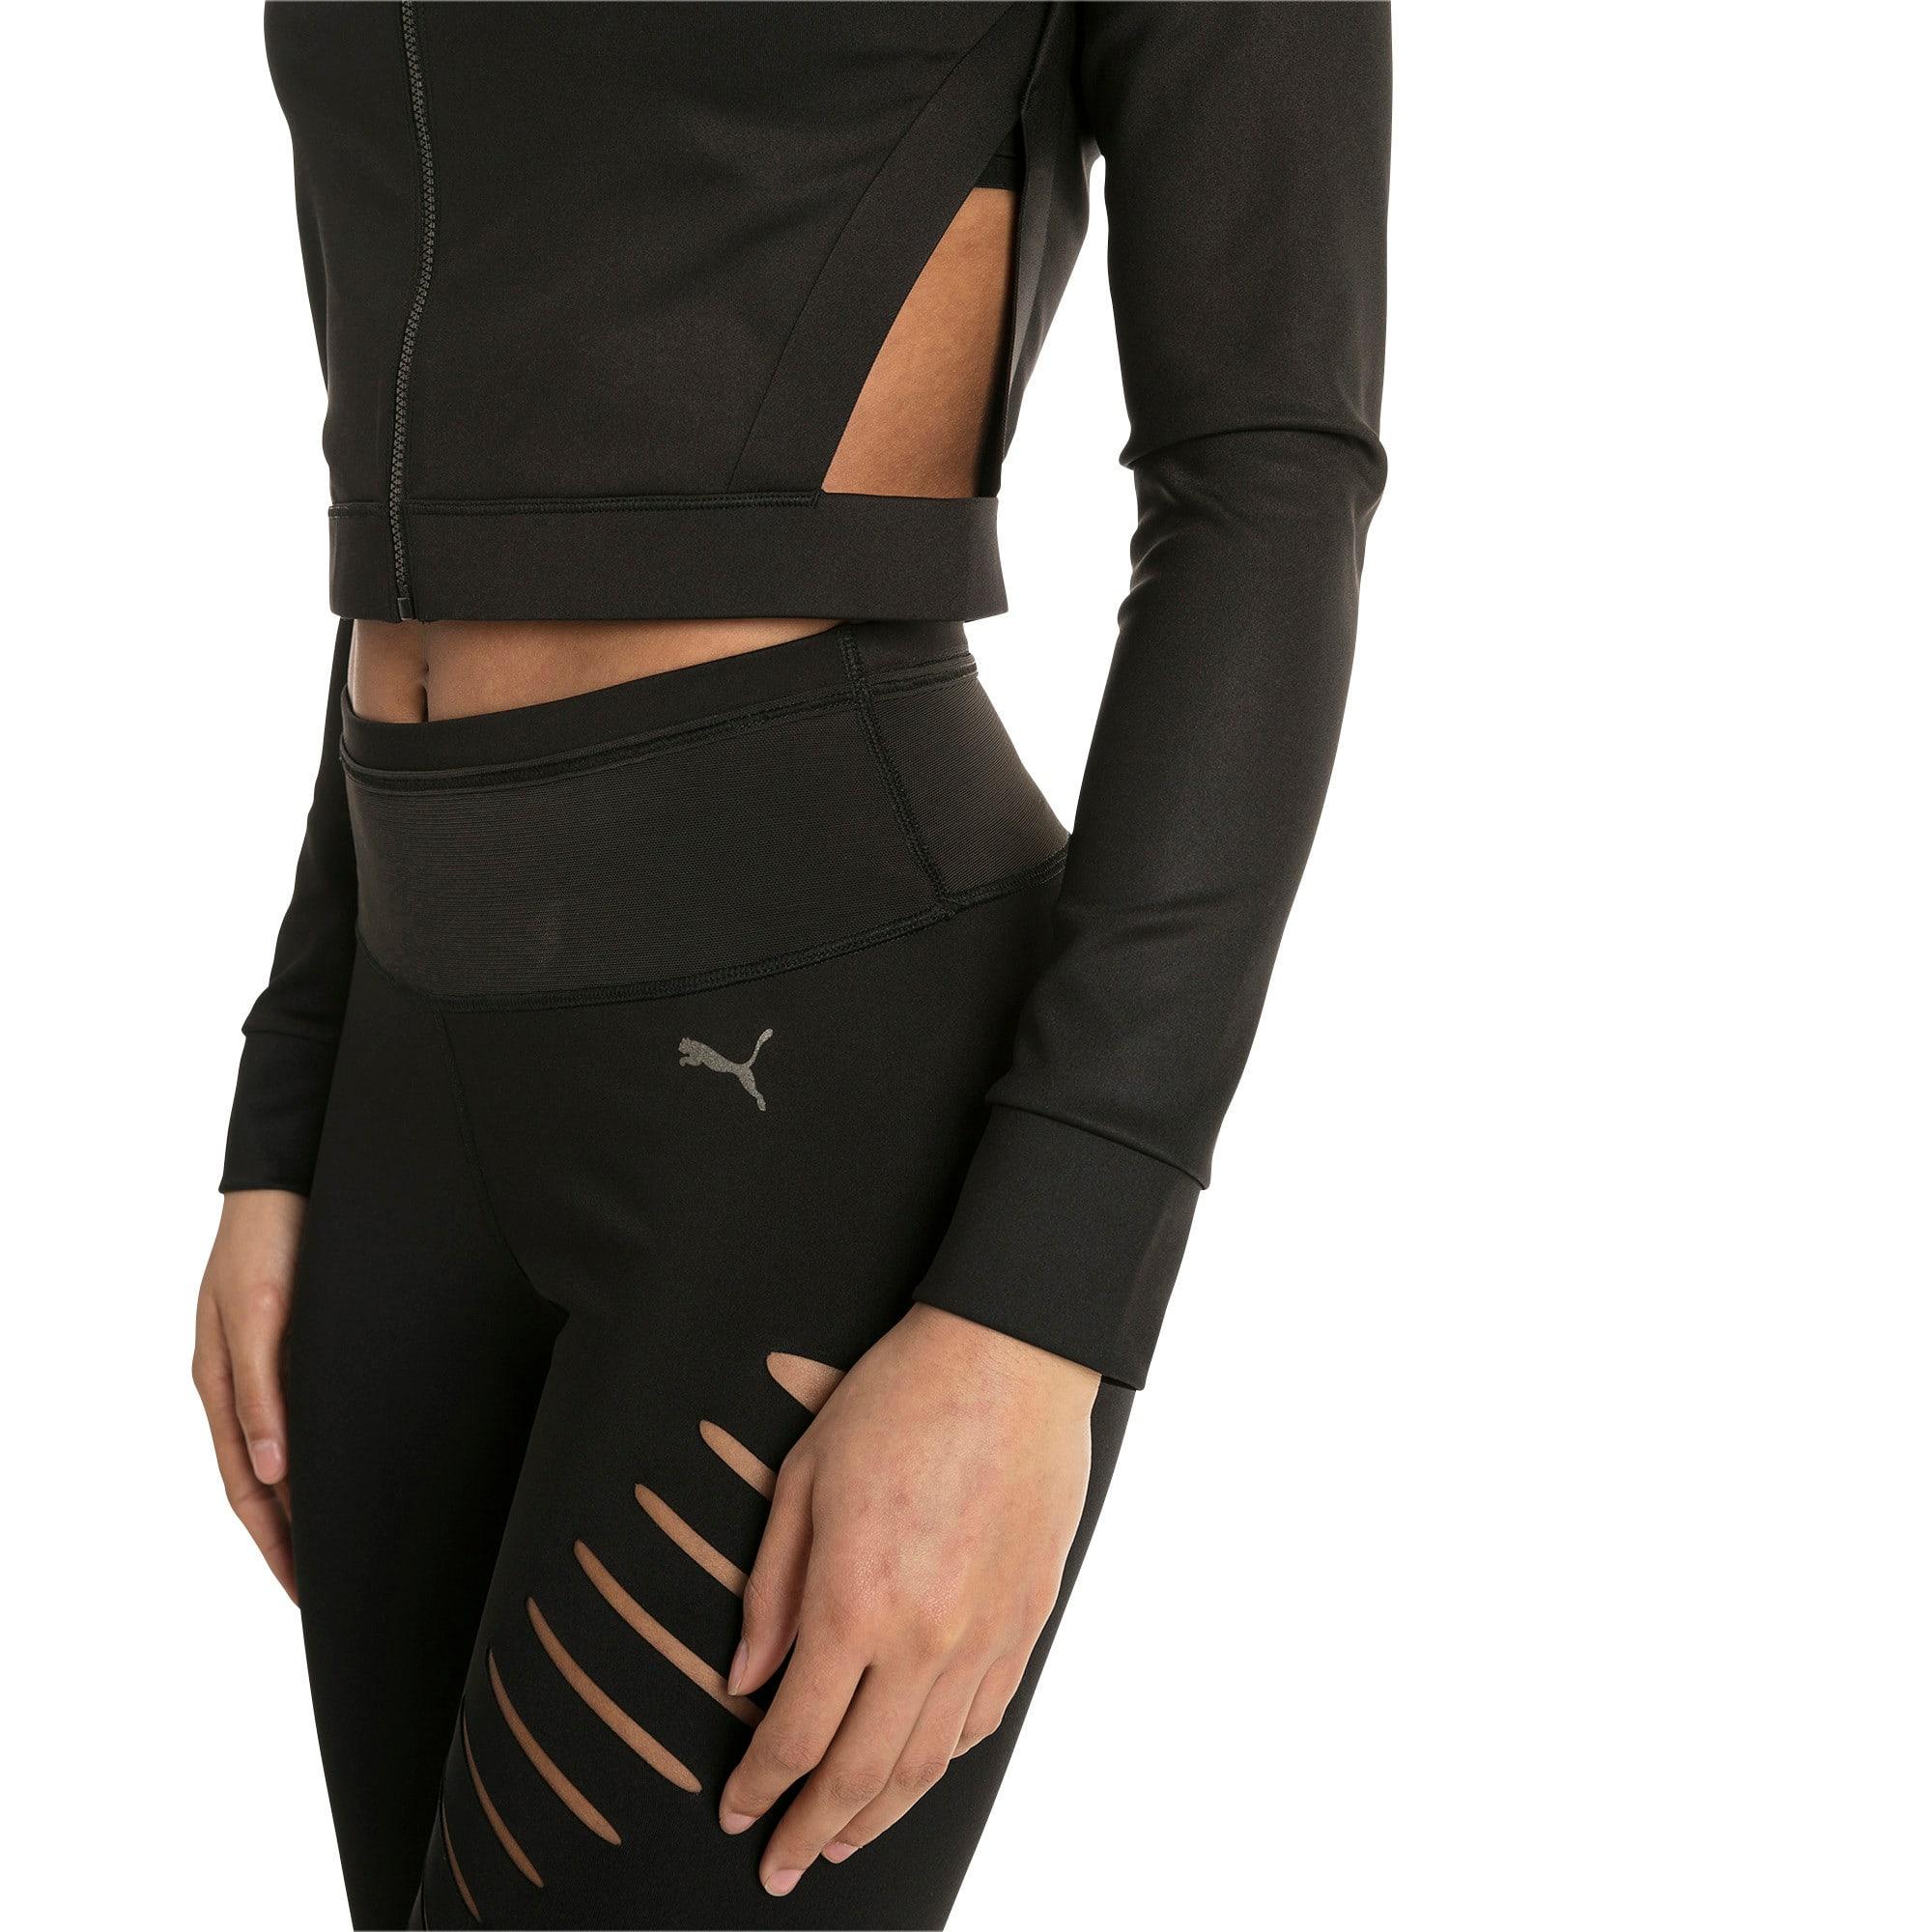 Thumbnail 4 of Explosive Cut-Out Women's Jacket, Puma Black, medium-IND